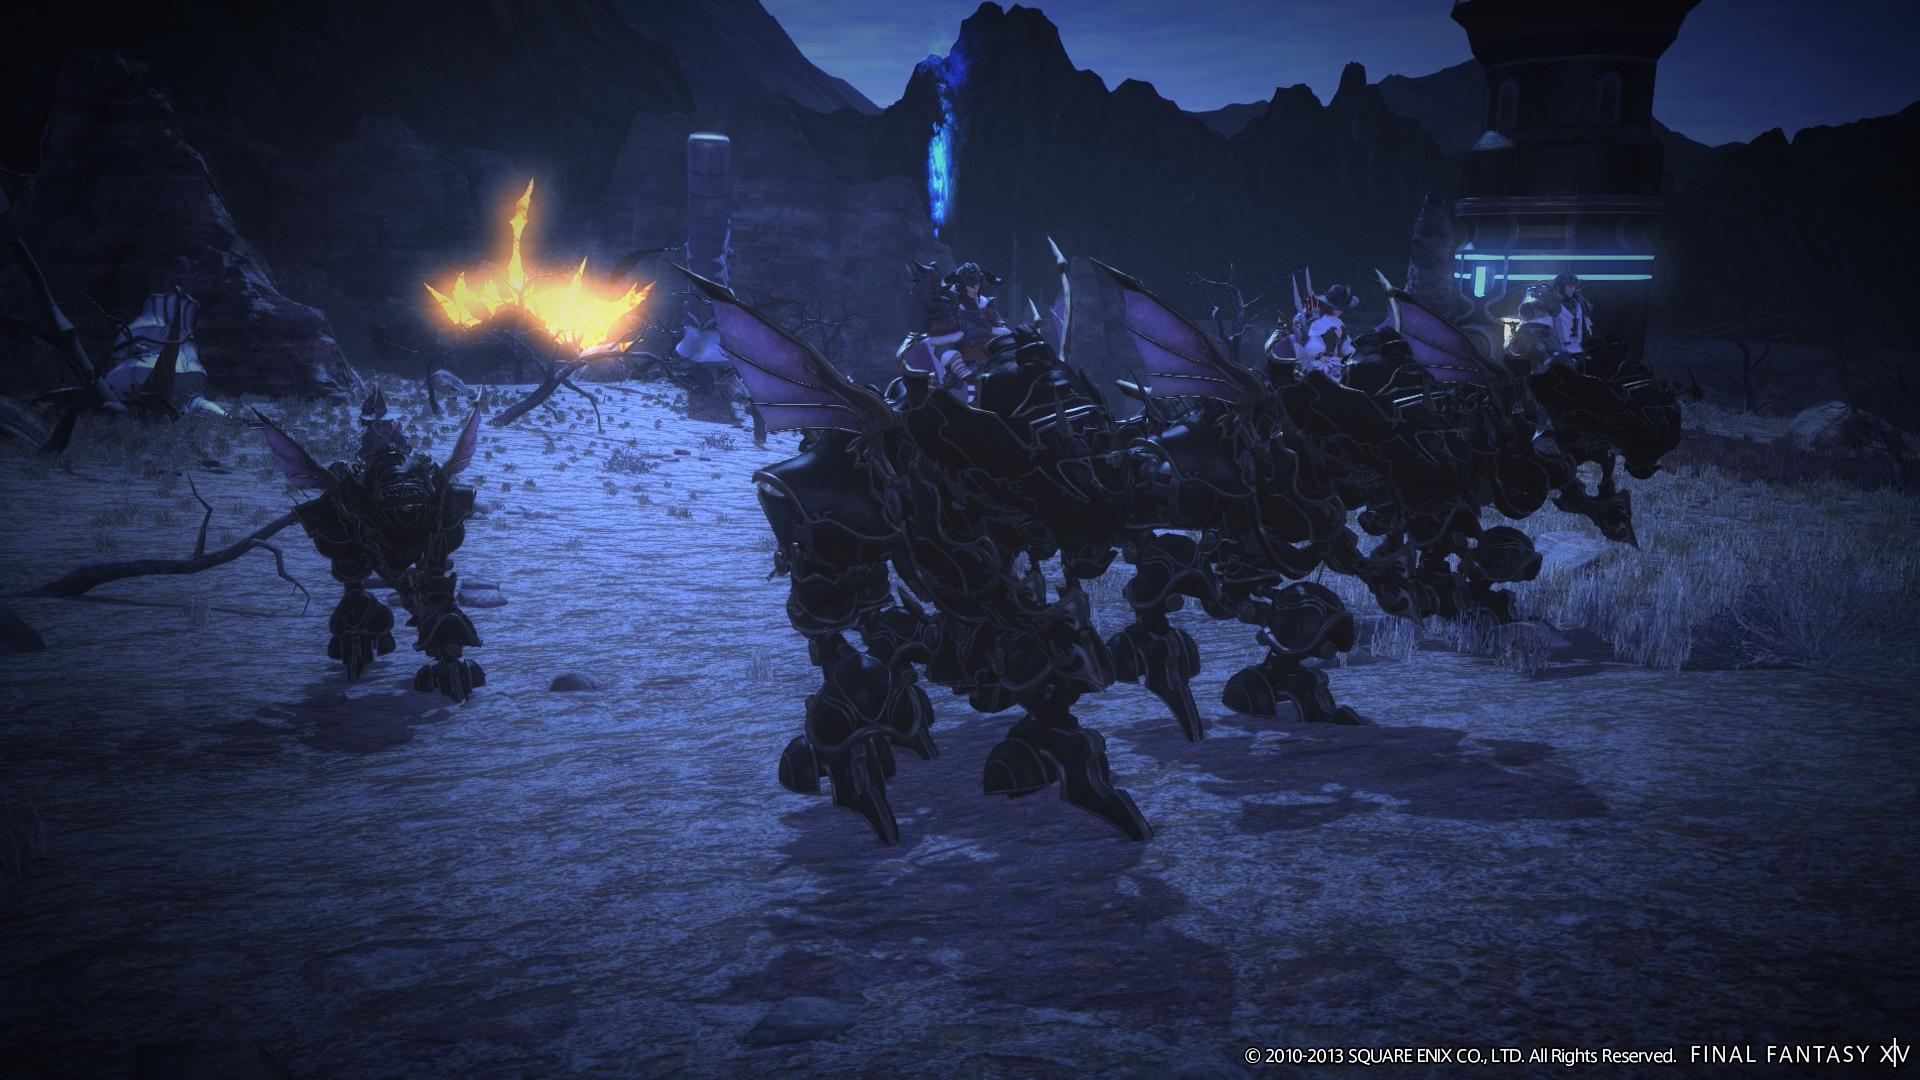 SGGAMINGINFO » Final Fantasy XIV: A Realm Reborn review